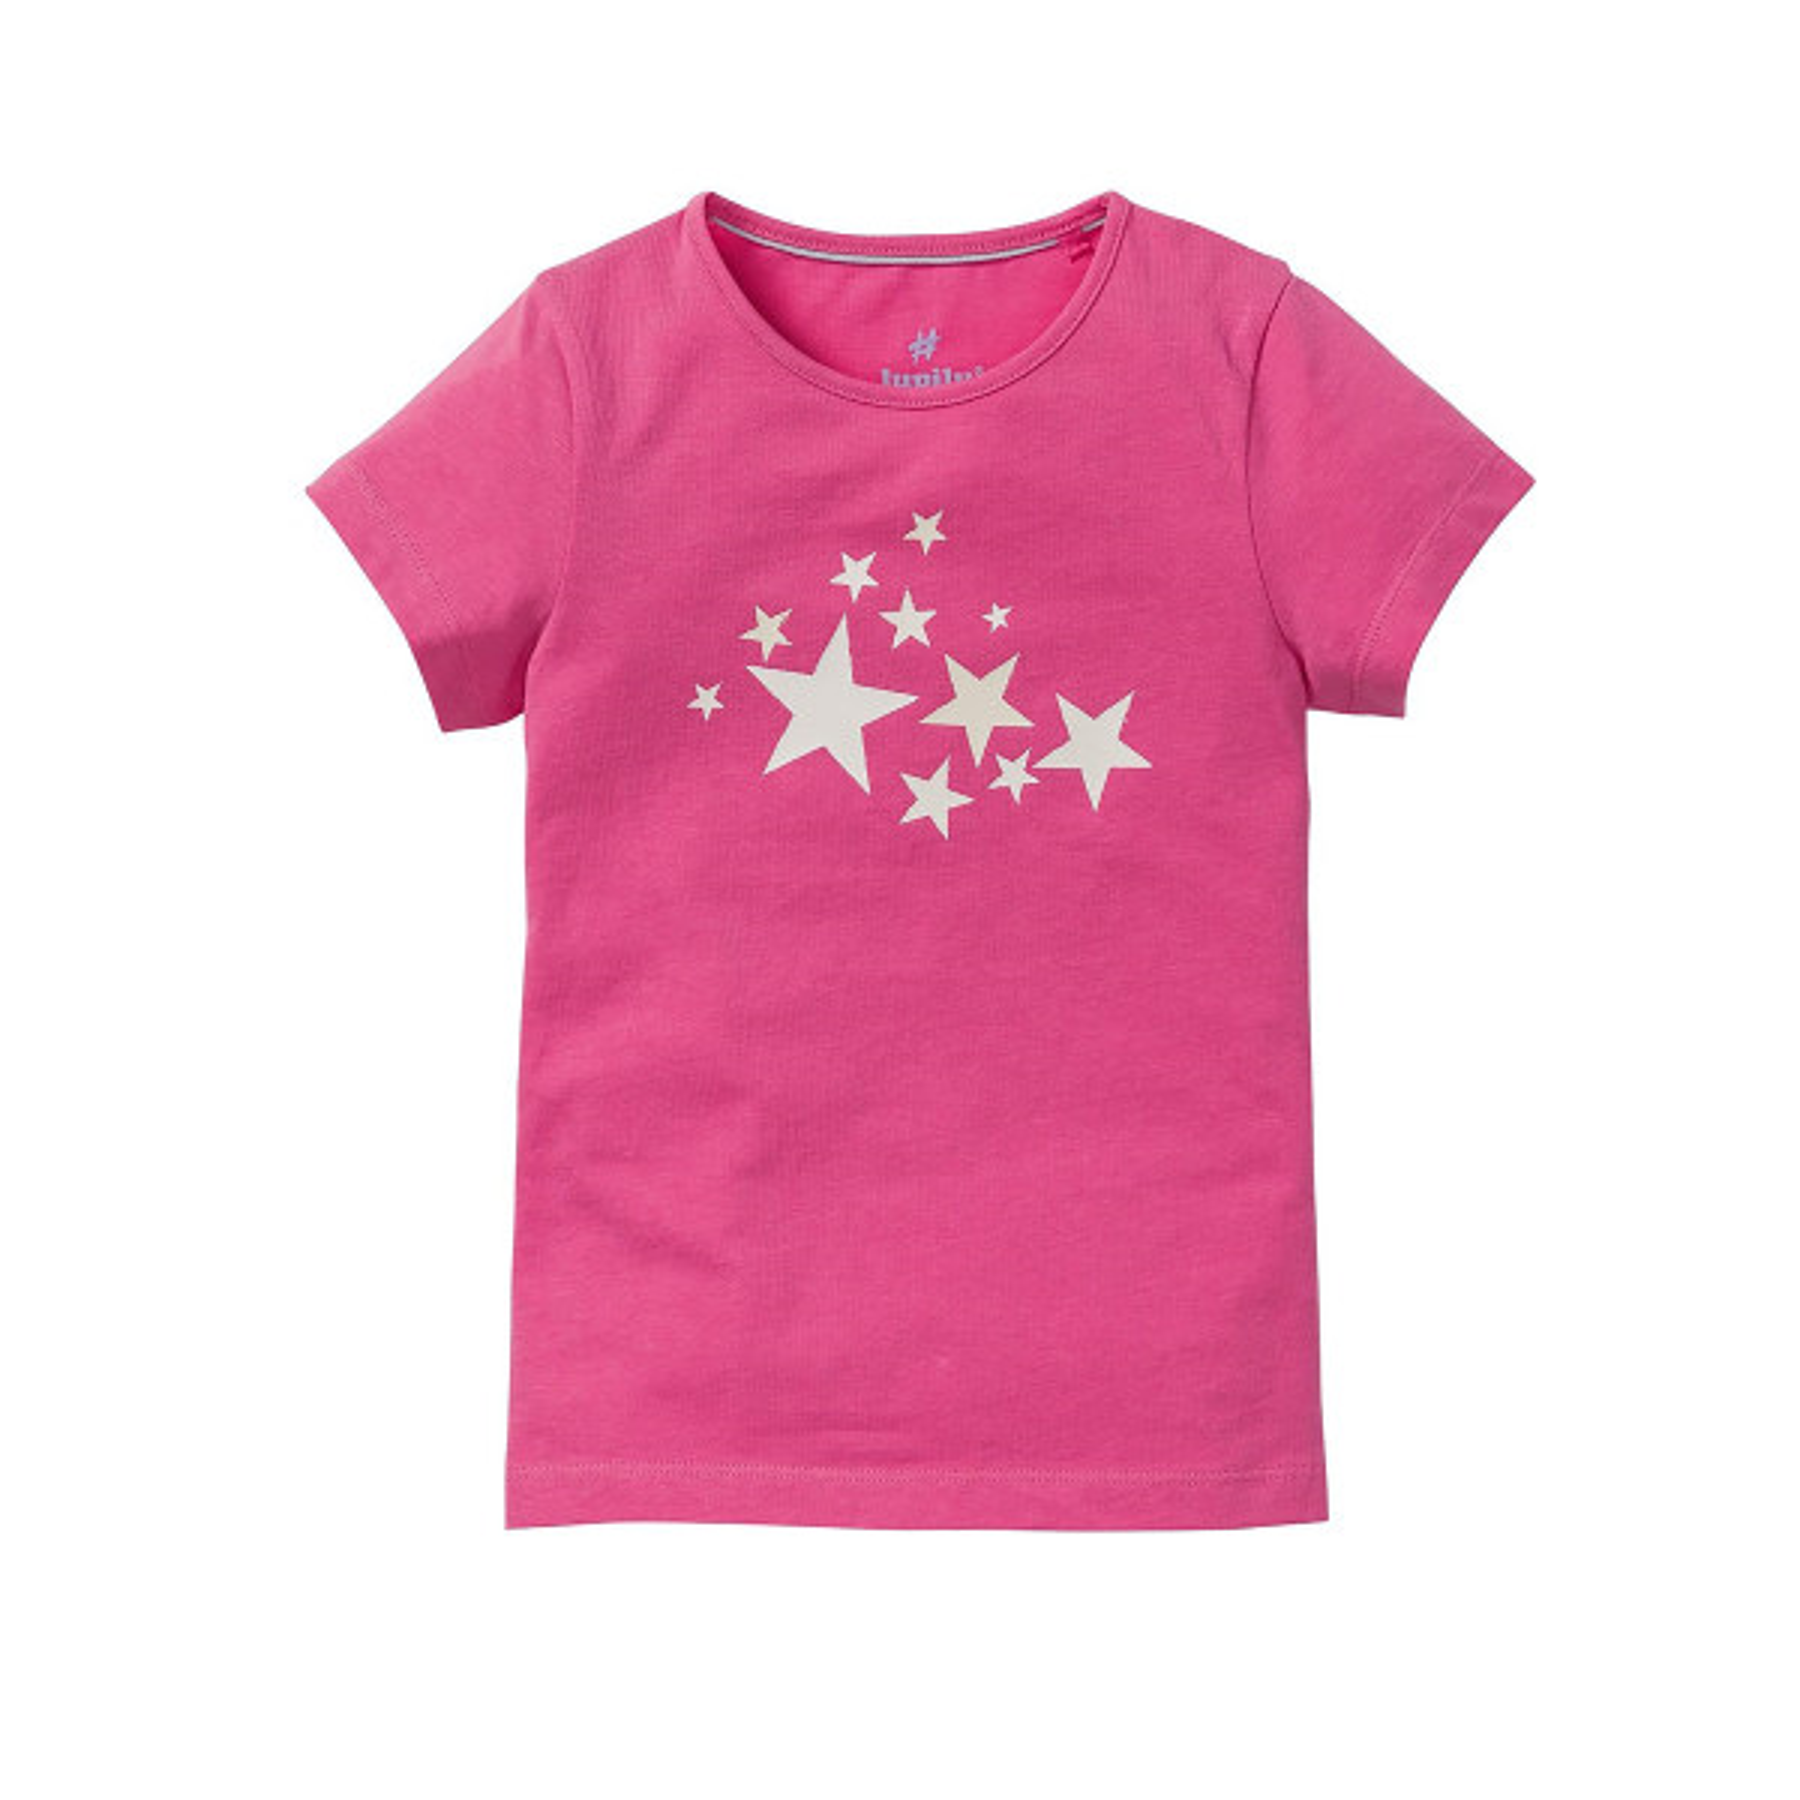 تی شرت دخترانه لوپیلو کد lusb115